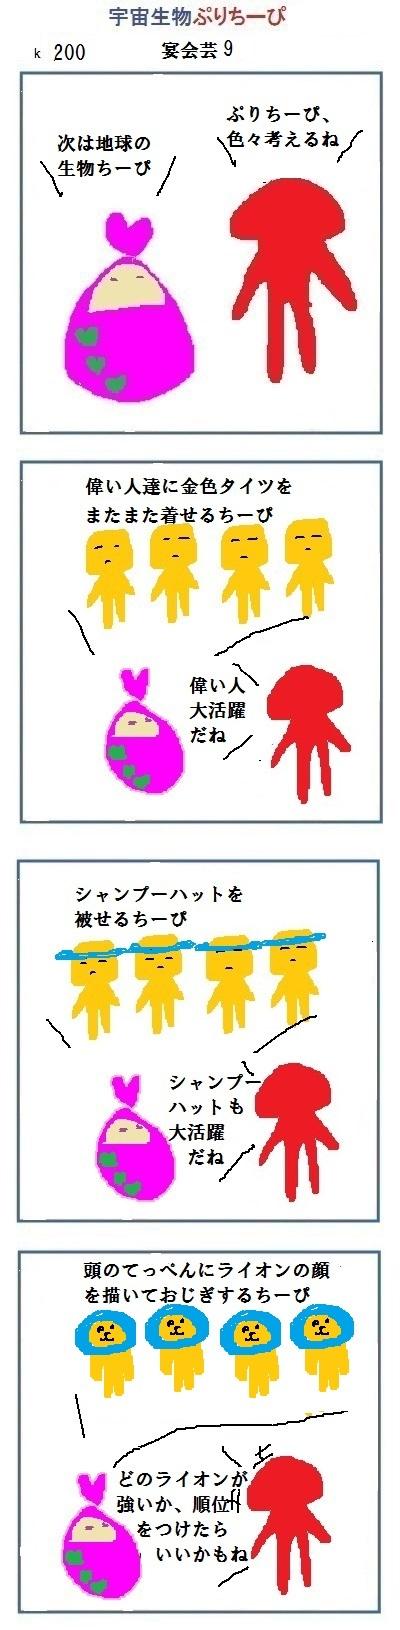 20161201085524e1b.jpg